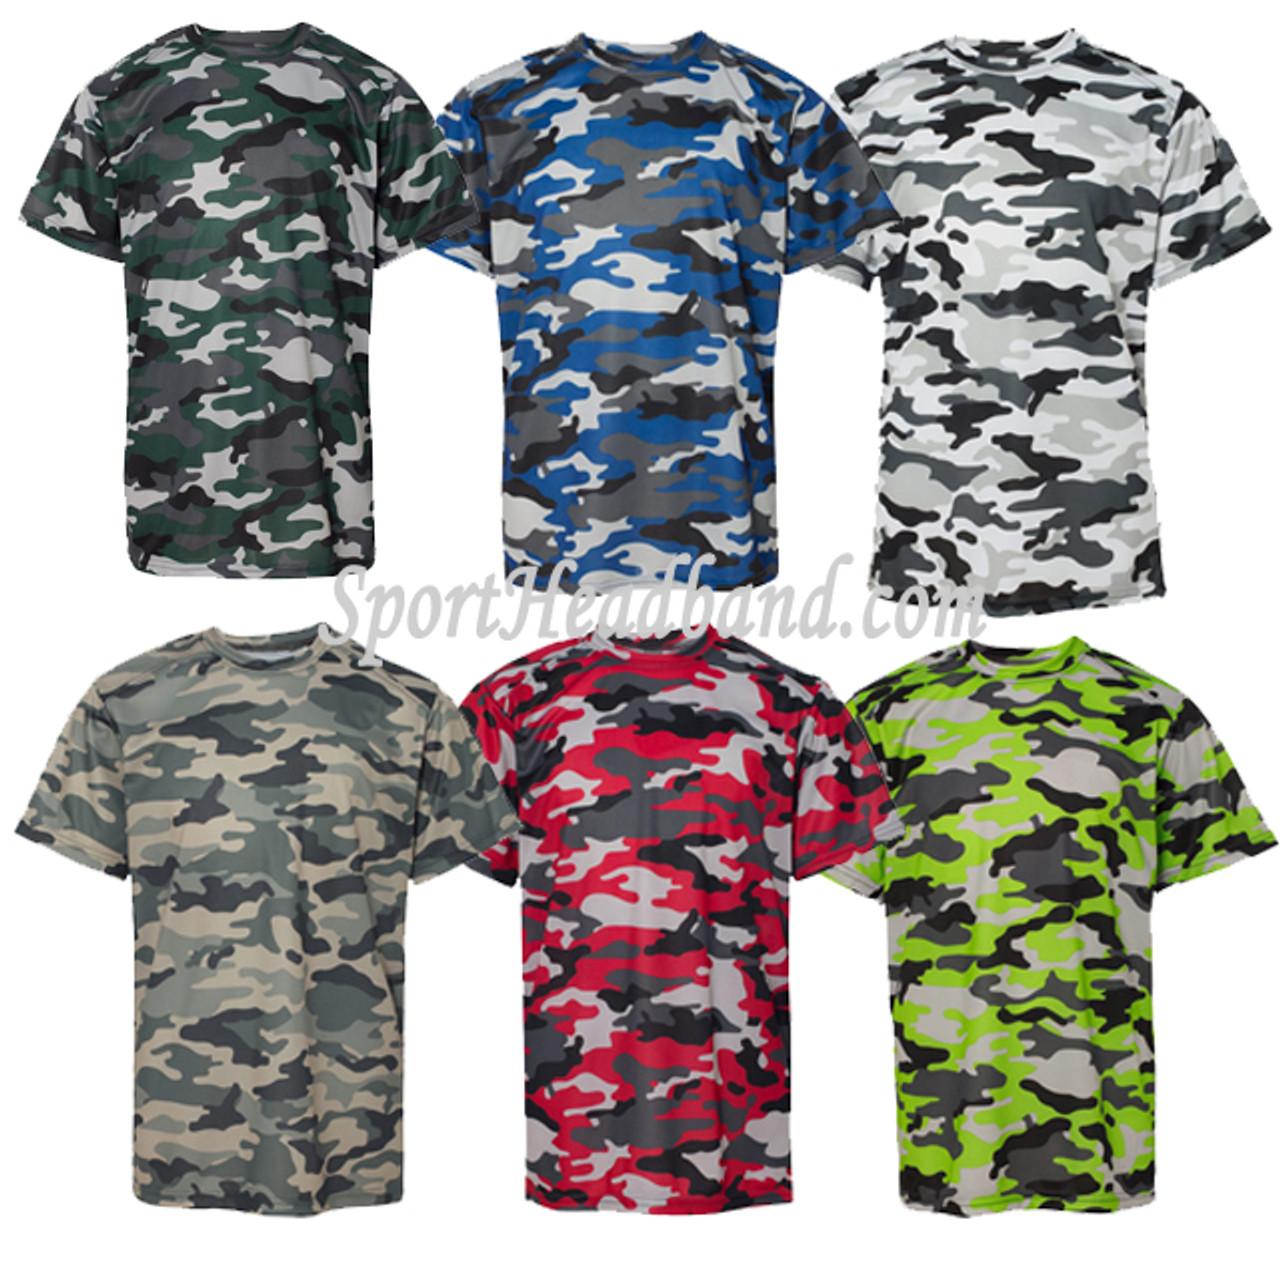 f32ad2fc Youth Camouflage Short Sleeve Tee Shirt - SportHeadband.com